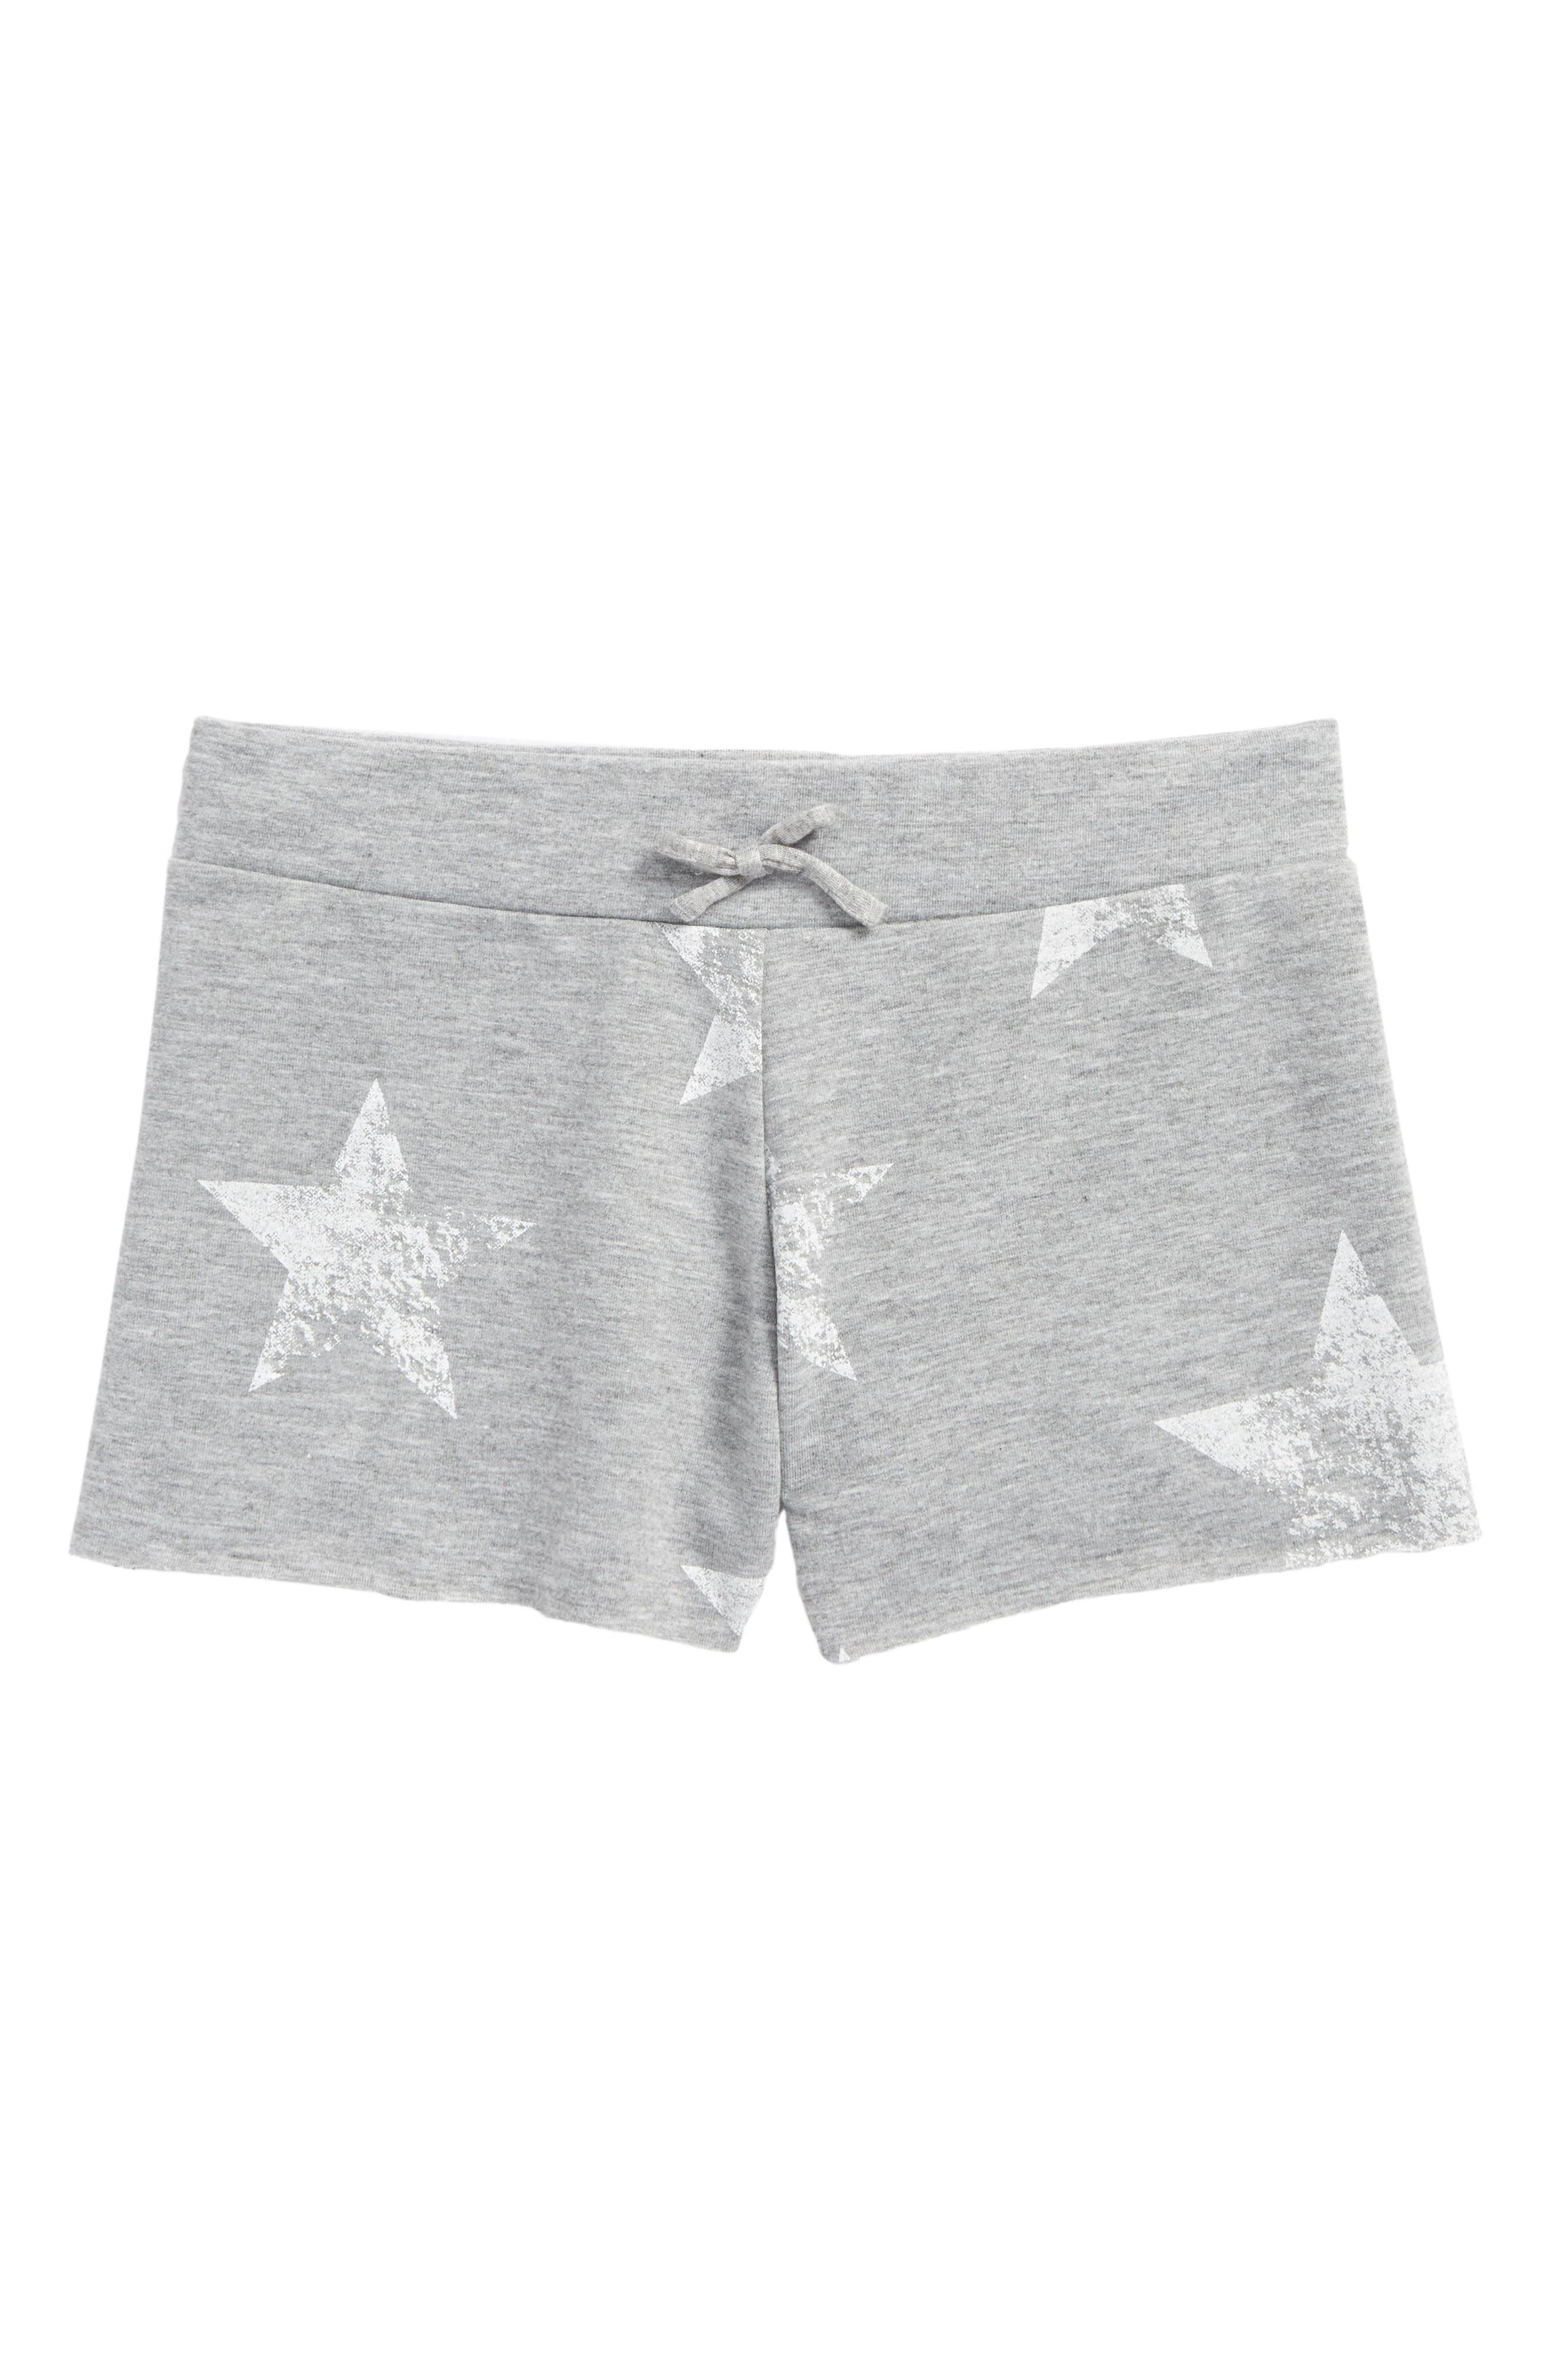 Star Print Knit Shorts,                         Main,                         color, Grey Mgrwst Stars Mgrwst